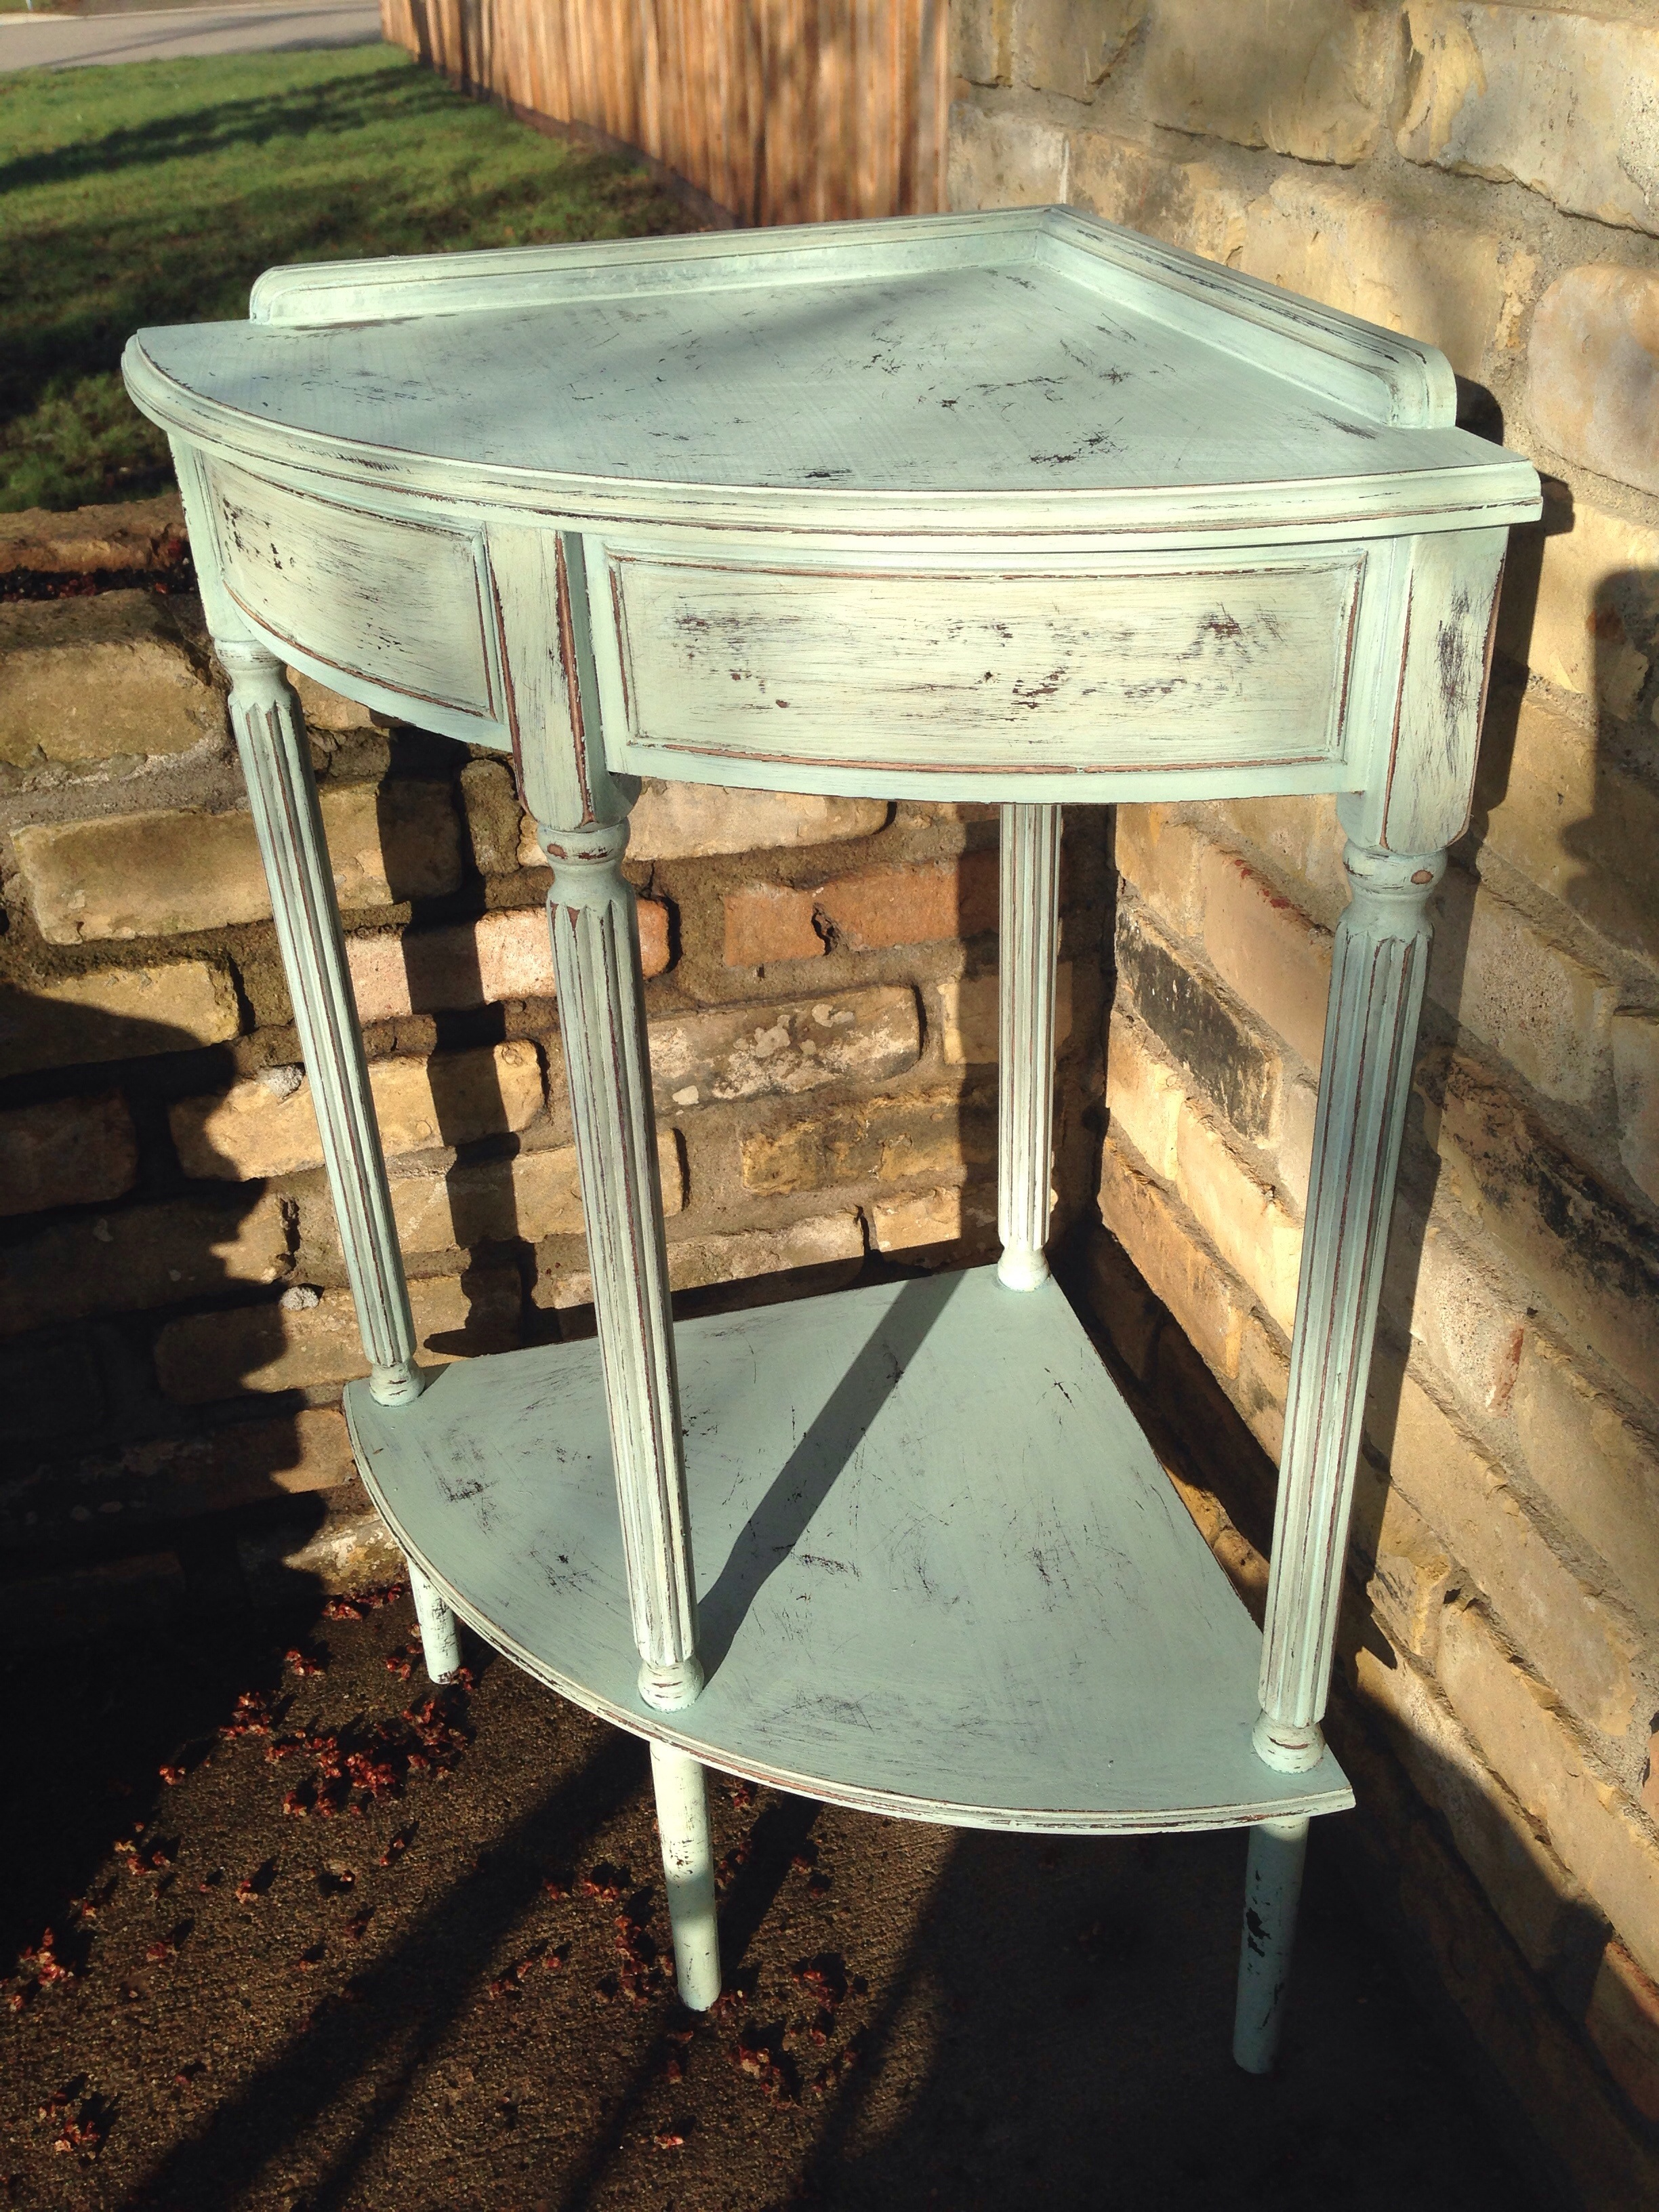 Eulalie's Sky Milk Paint Corner Table | Carver Junk Company | Recycle. Repurpose. Relove.